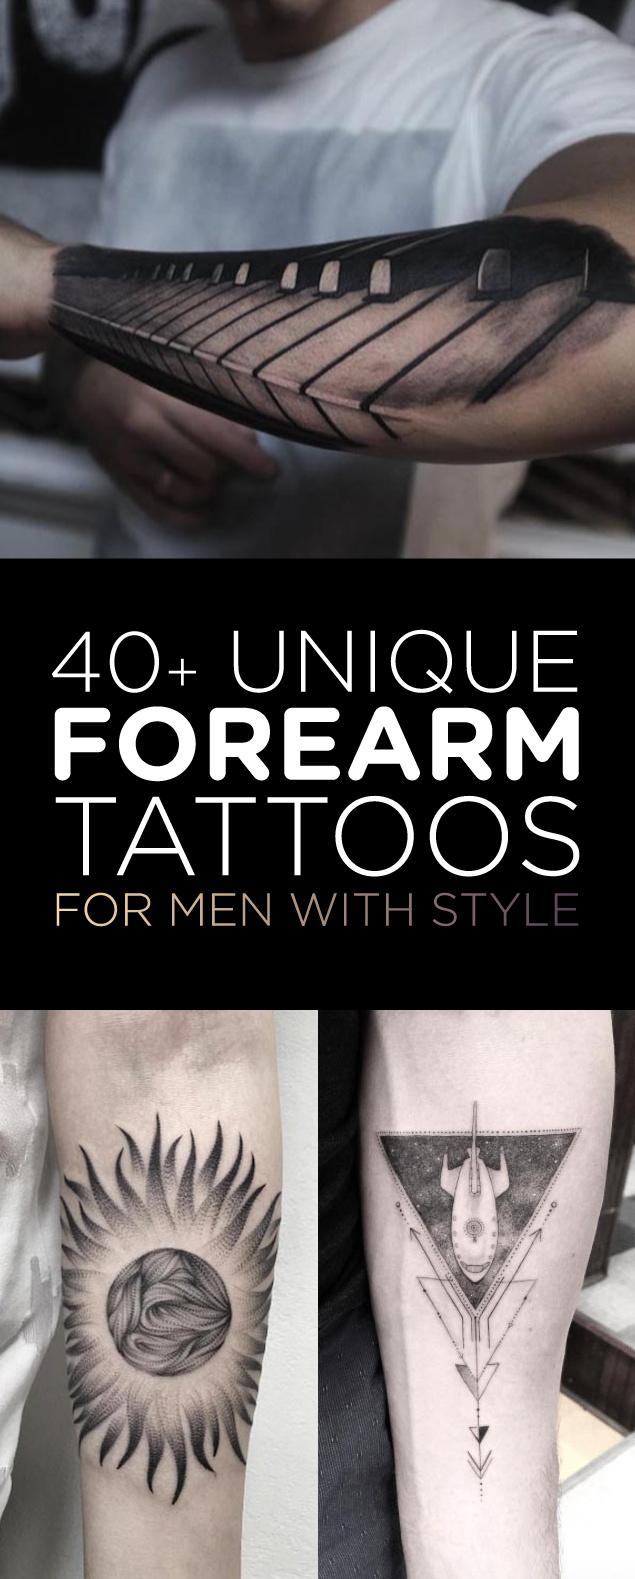 Forearm Tattoo Ideas For Men : forearm, tattoo, ideas, Unique, Forearm, Tattoos, Style, TattooBlend